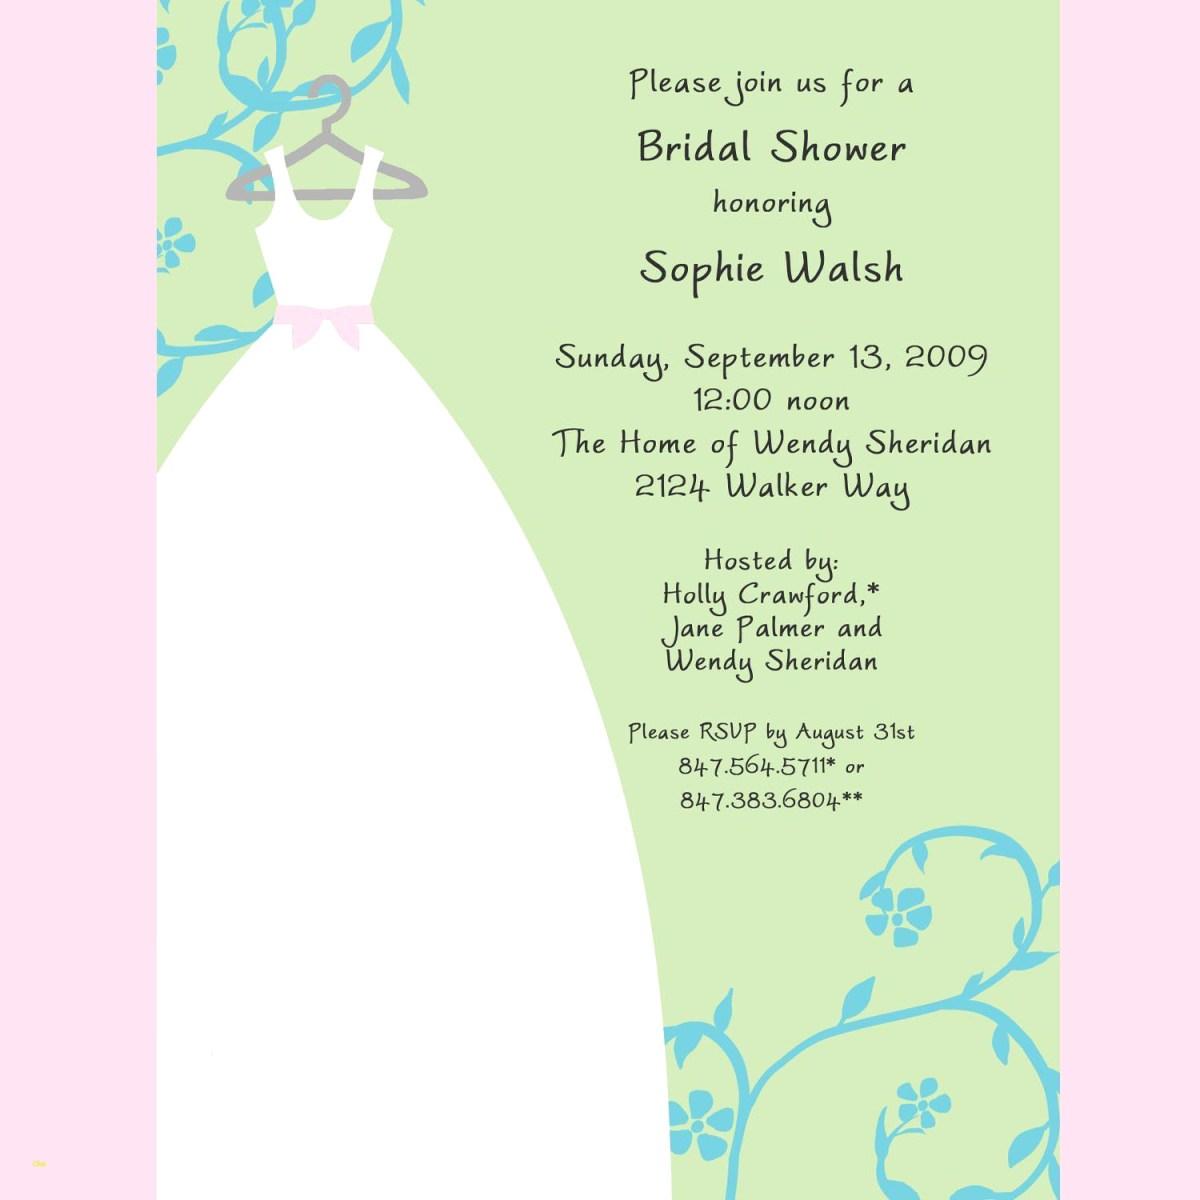 Free Wedding Shower Invitation Templates Free Bridal Shower Invitation Templates Inspirational Bridal Shower